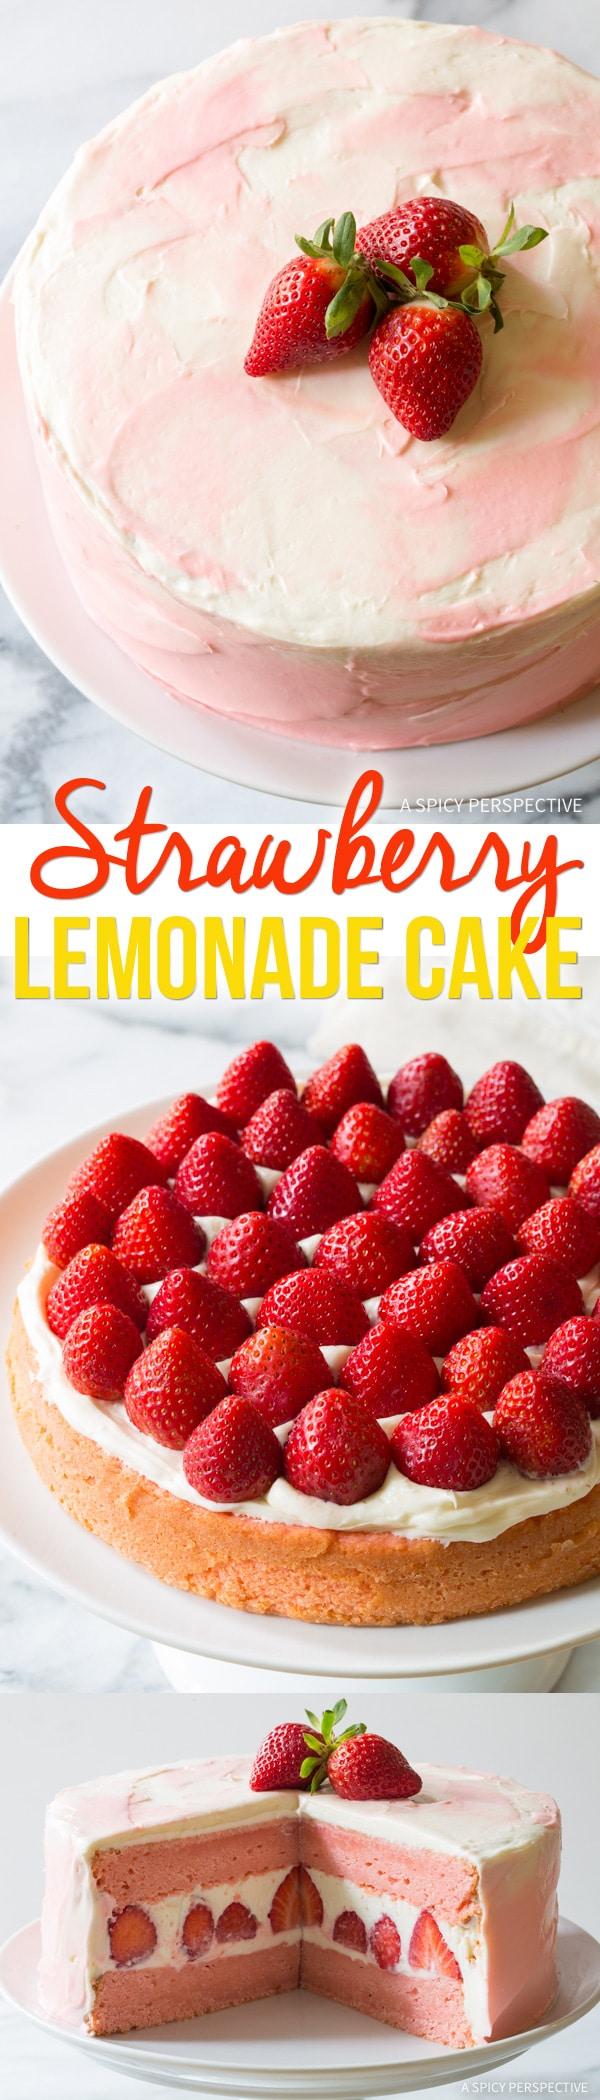 Perfect Fresh Strawberry Lemonade Cake Recipe